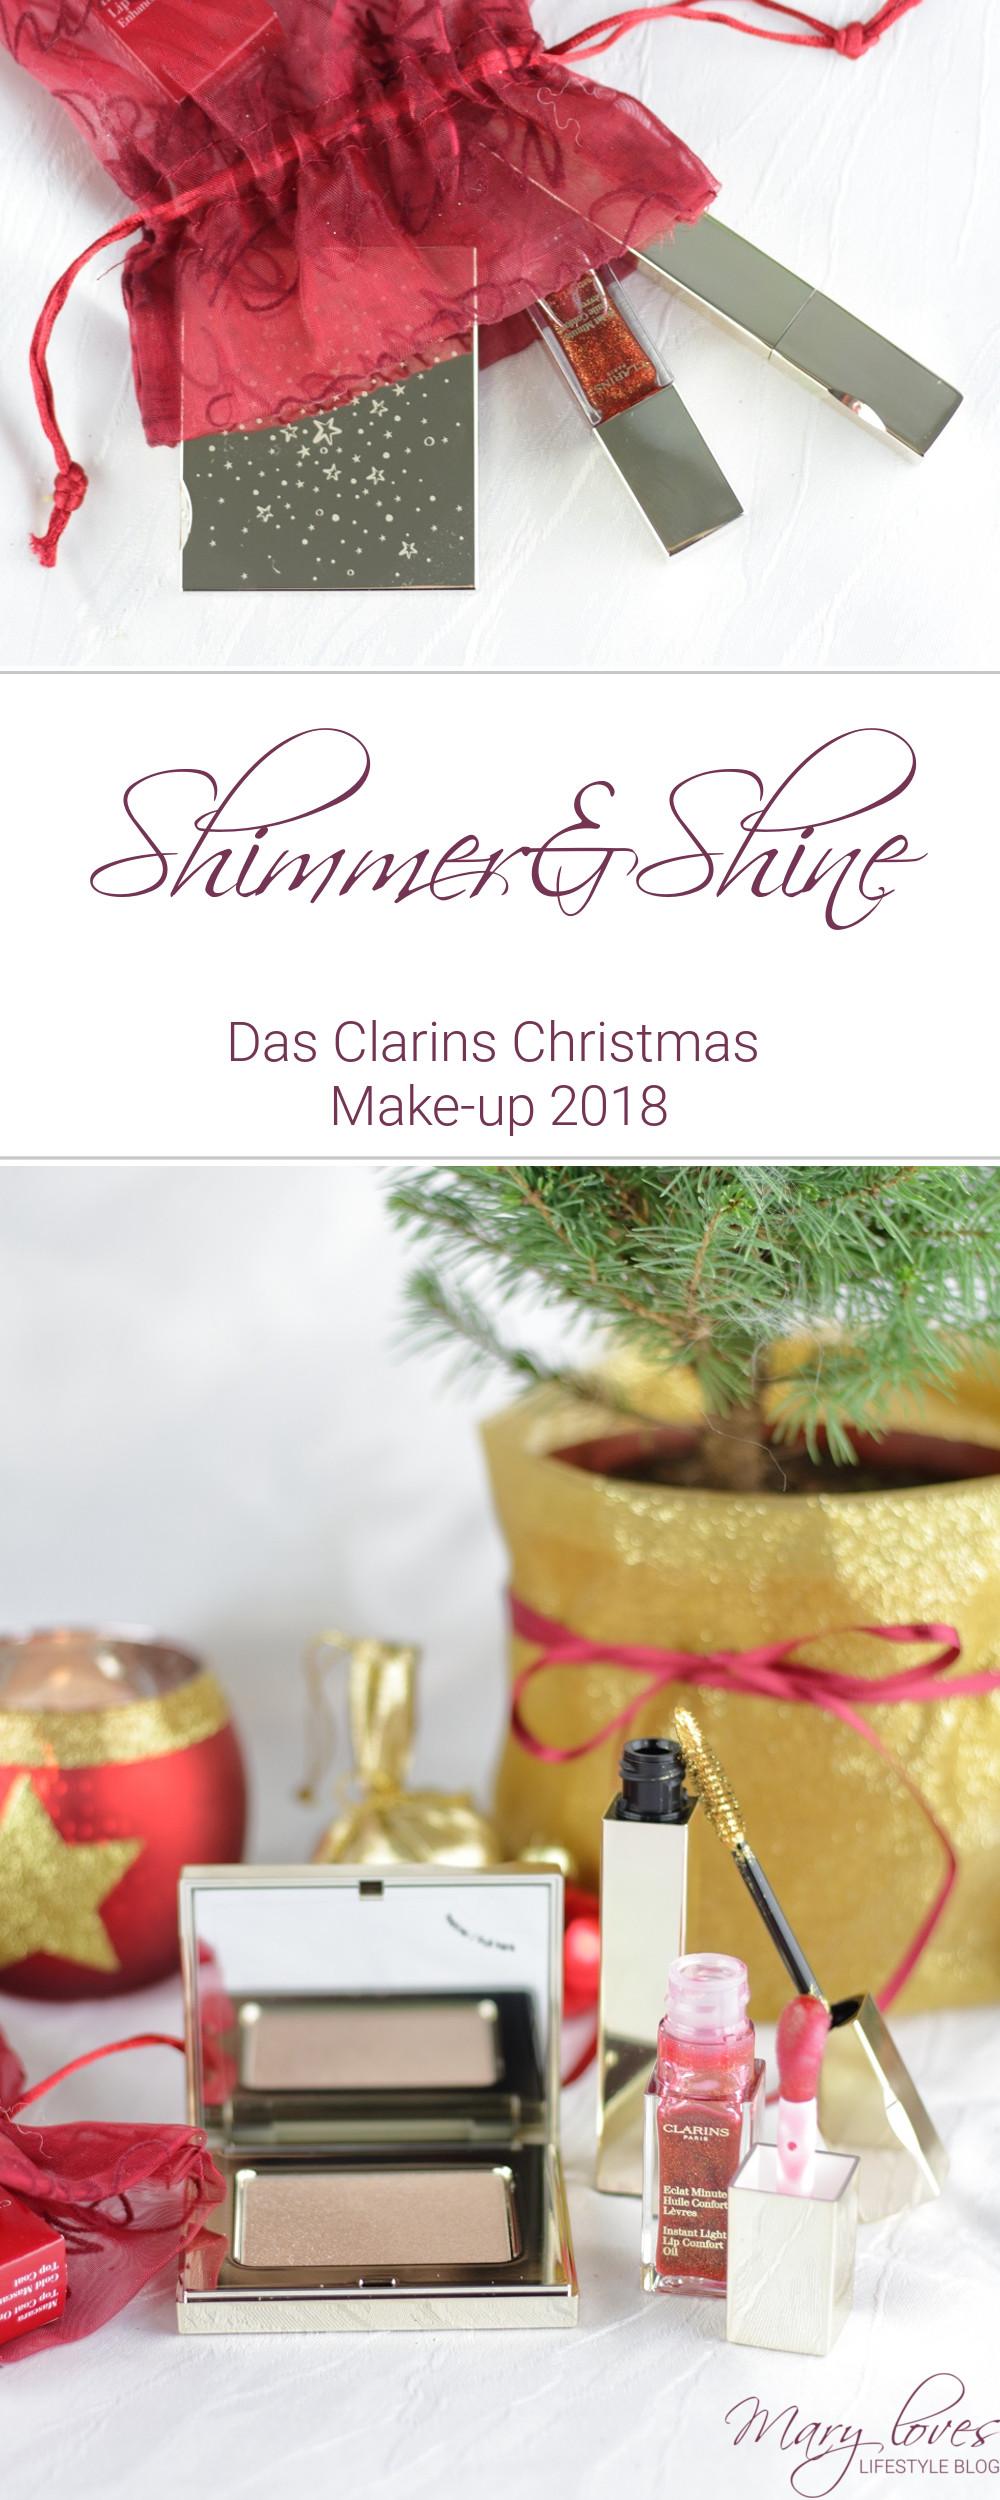 [Anzeige - Produktplatzierung] Shimmer & Shine - Clarins Christmas Make-up 2018 - #clarins #clarinsmakeup #makeup #weihnachtsmakeup #shimmerandshine #makeupkollektion #beauty